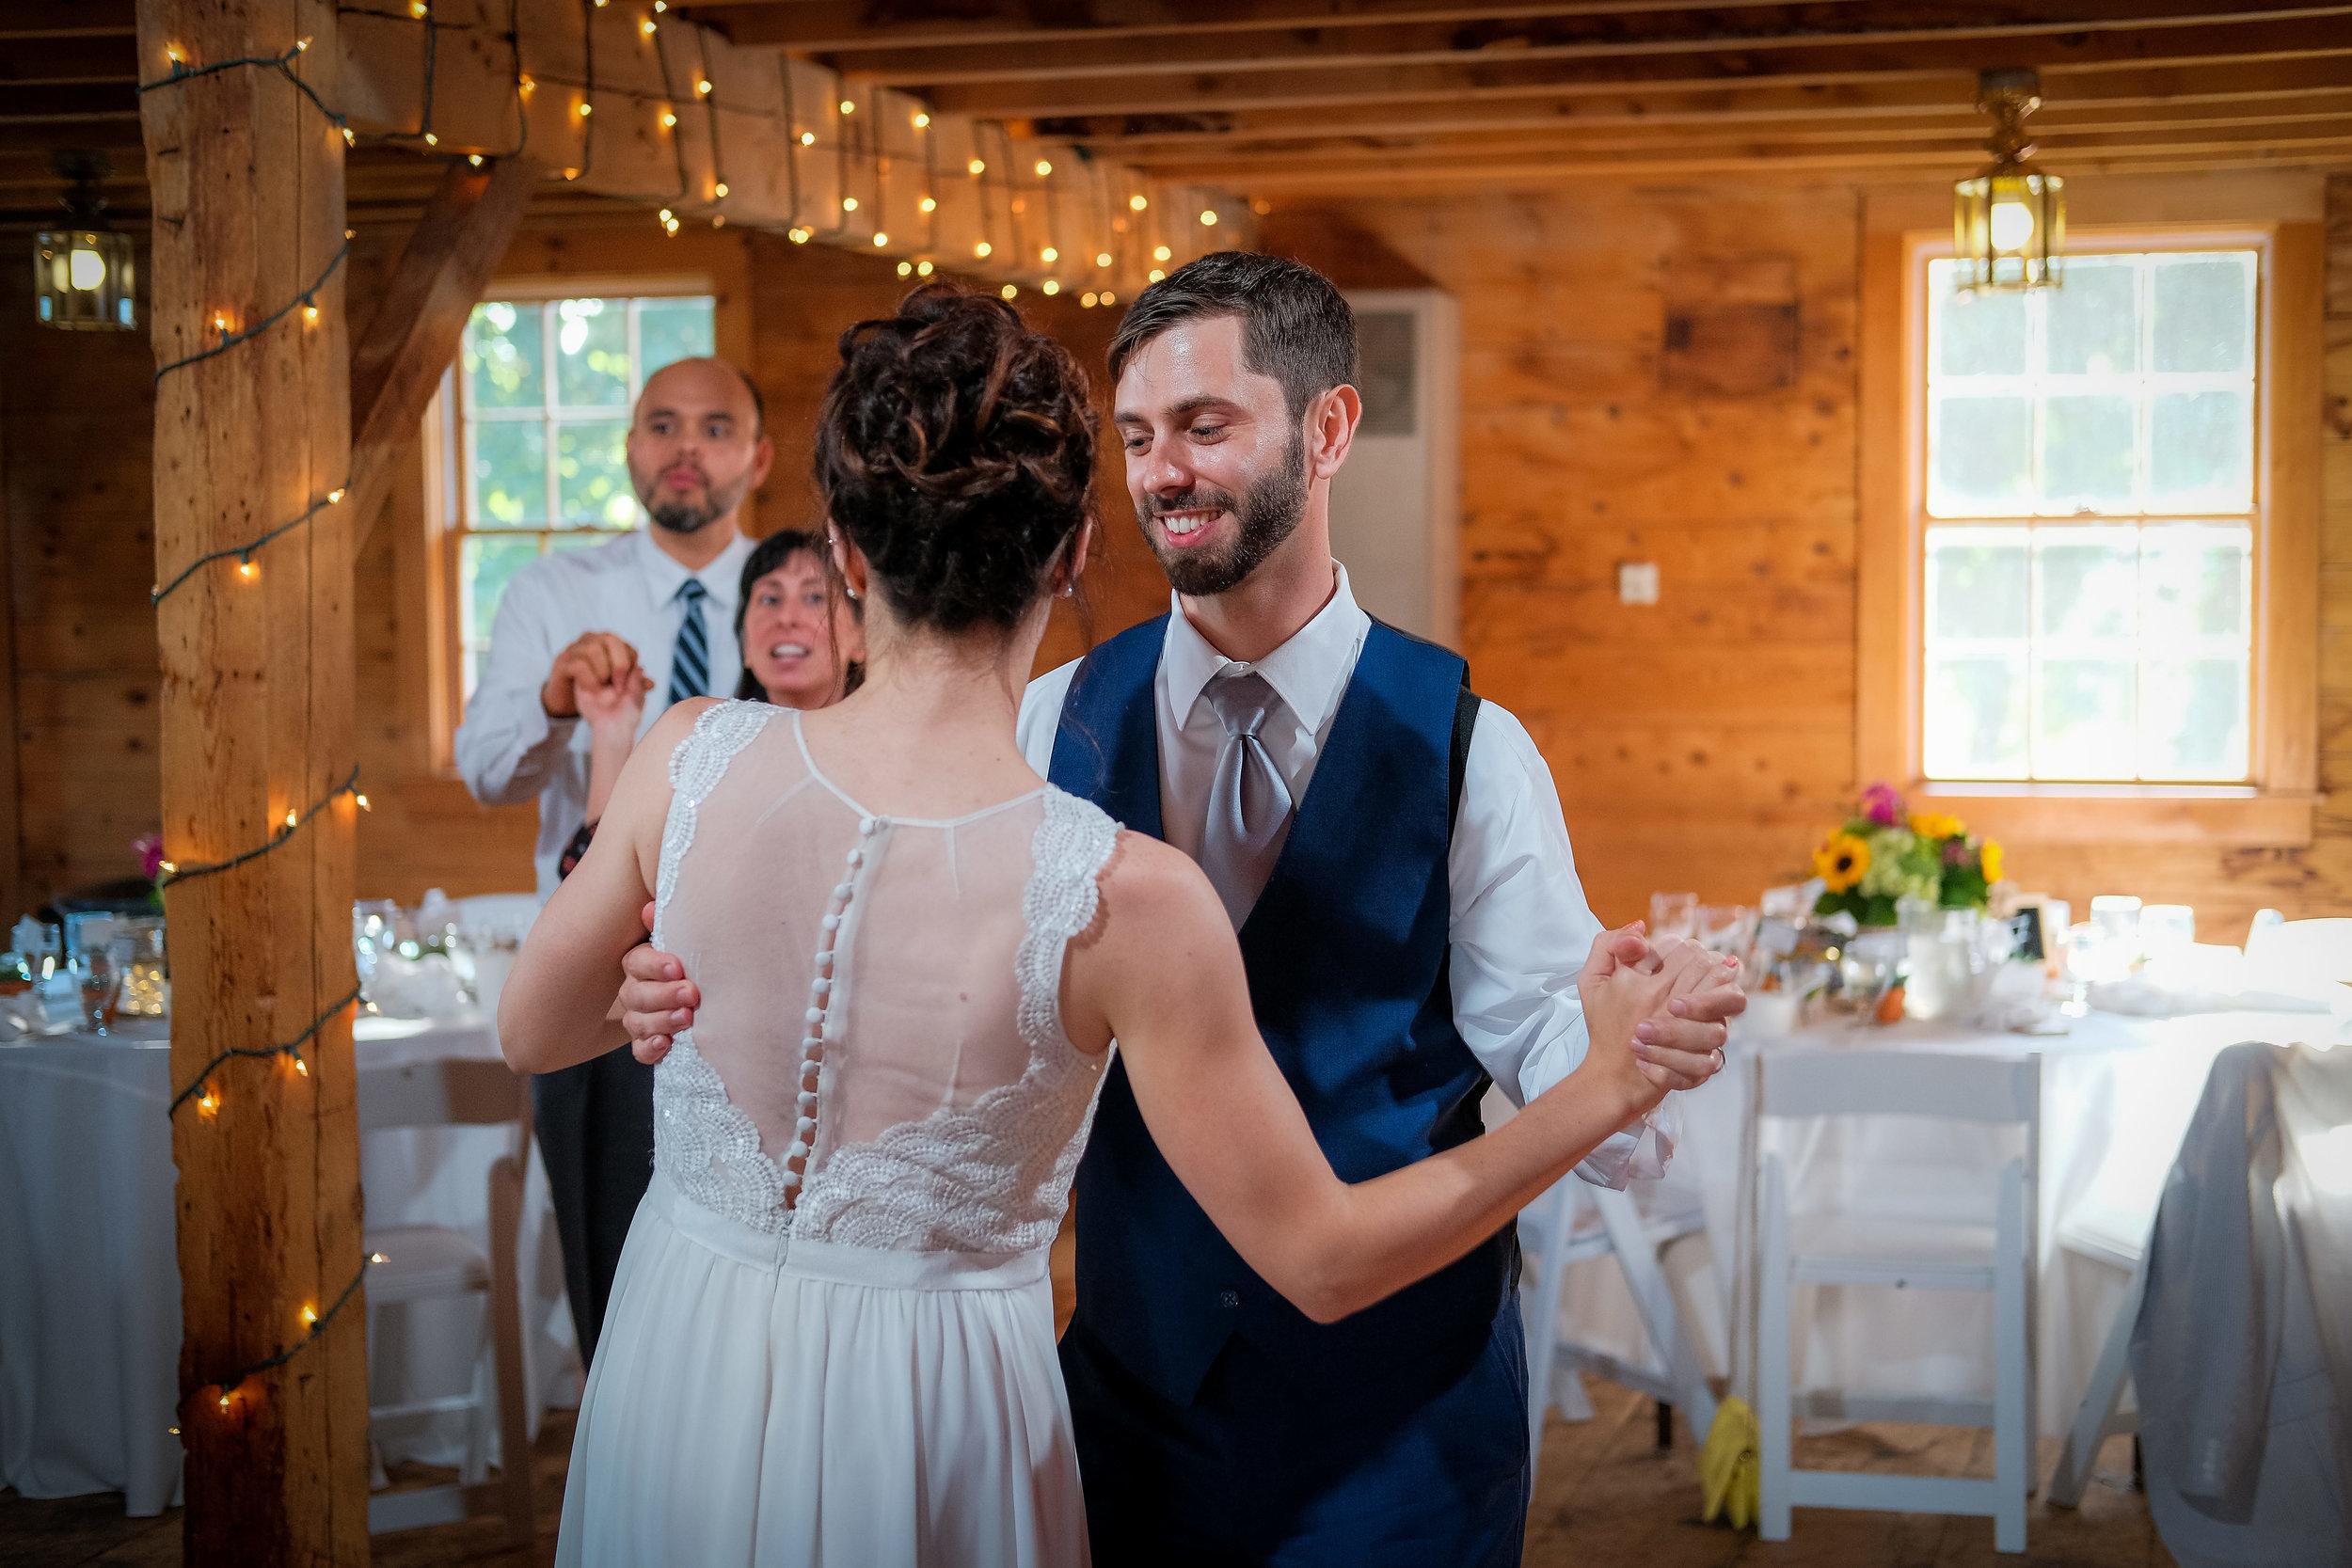 Peabody-Smith-Barn-Wedding-Photography-43.jpg